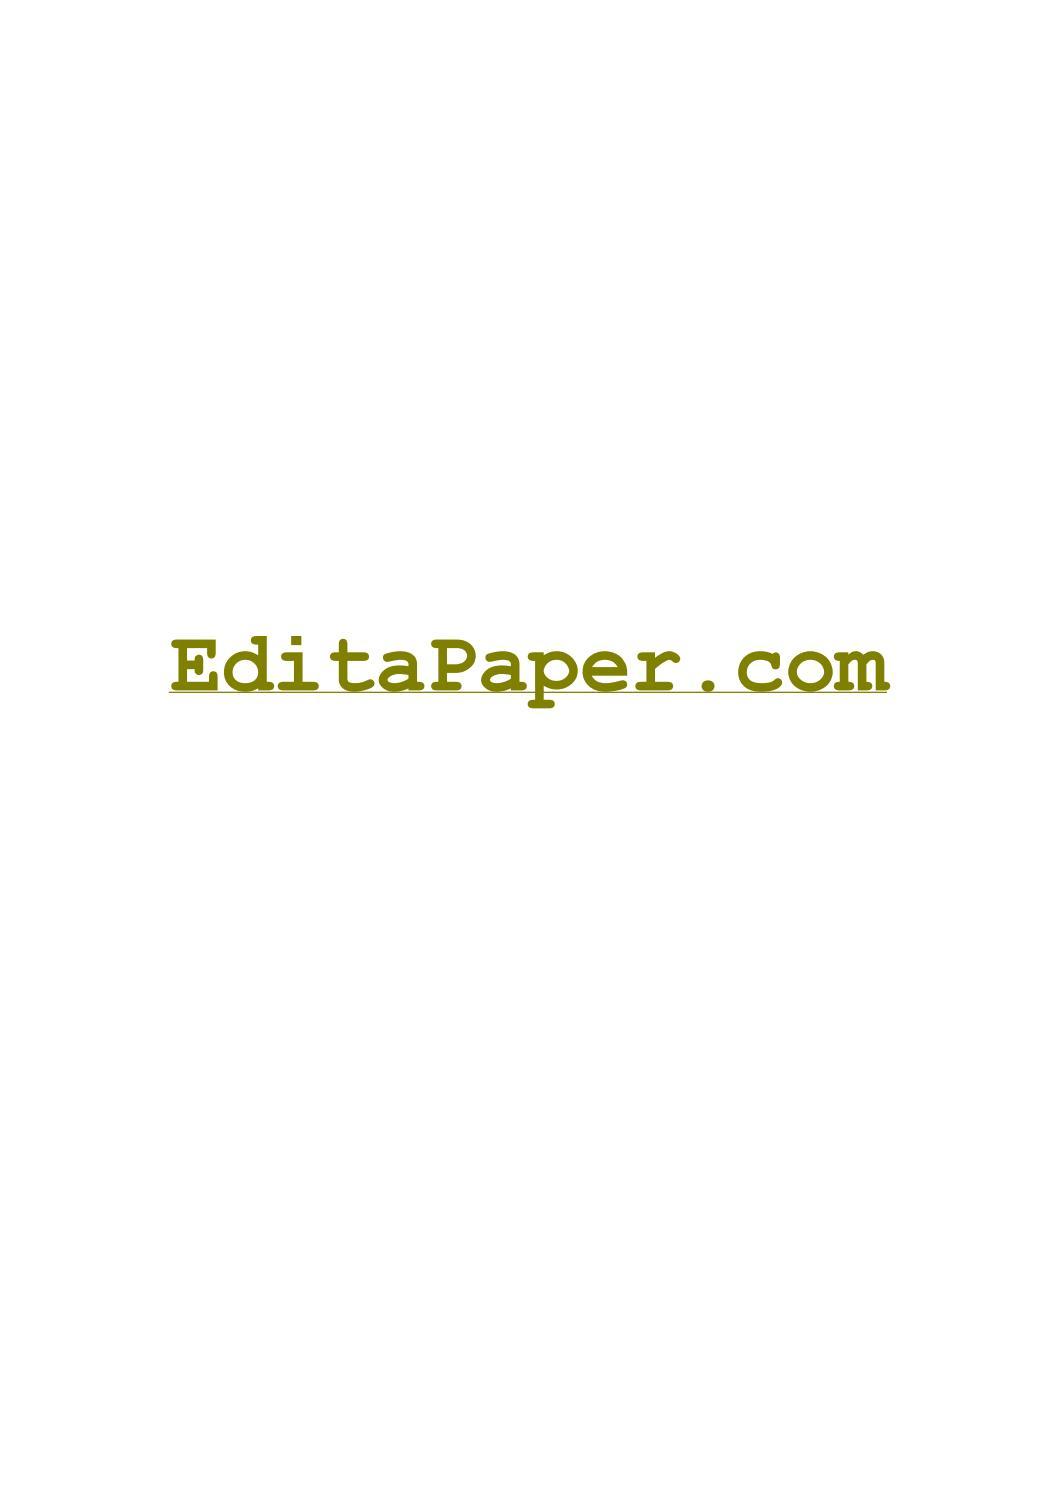 Dissertation thesis help support center nj